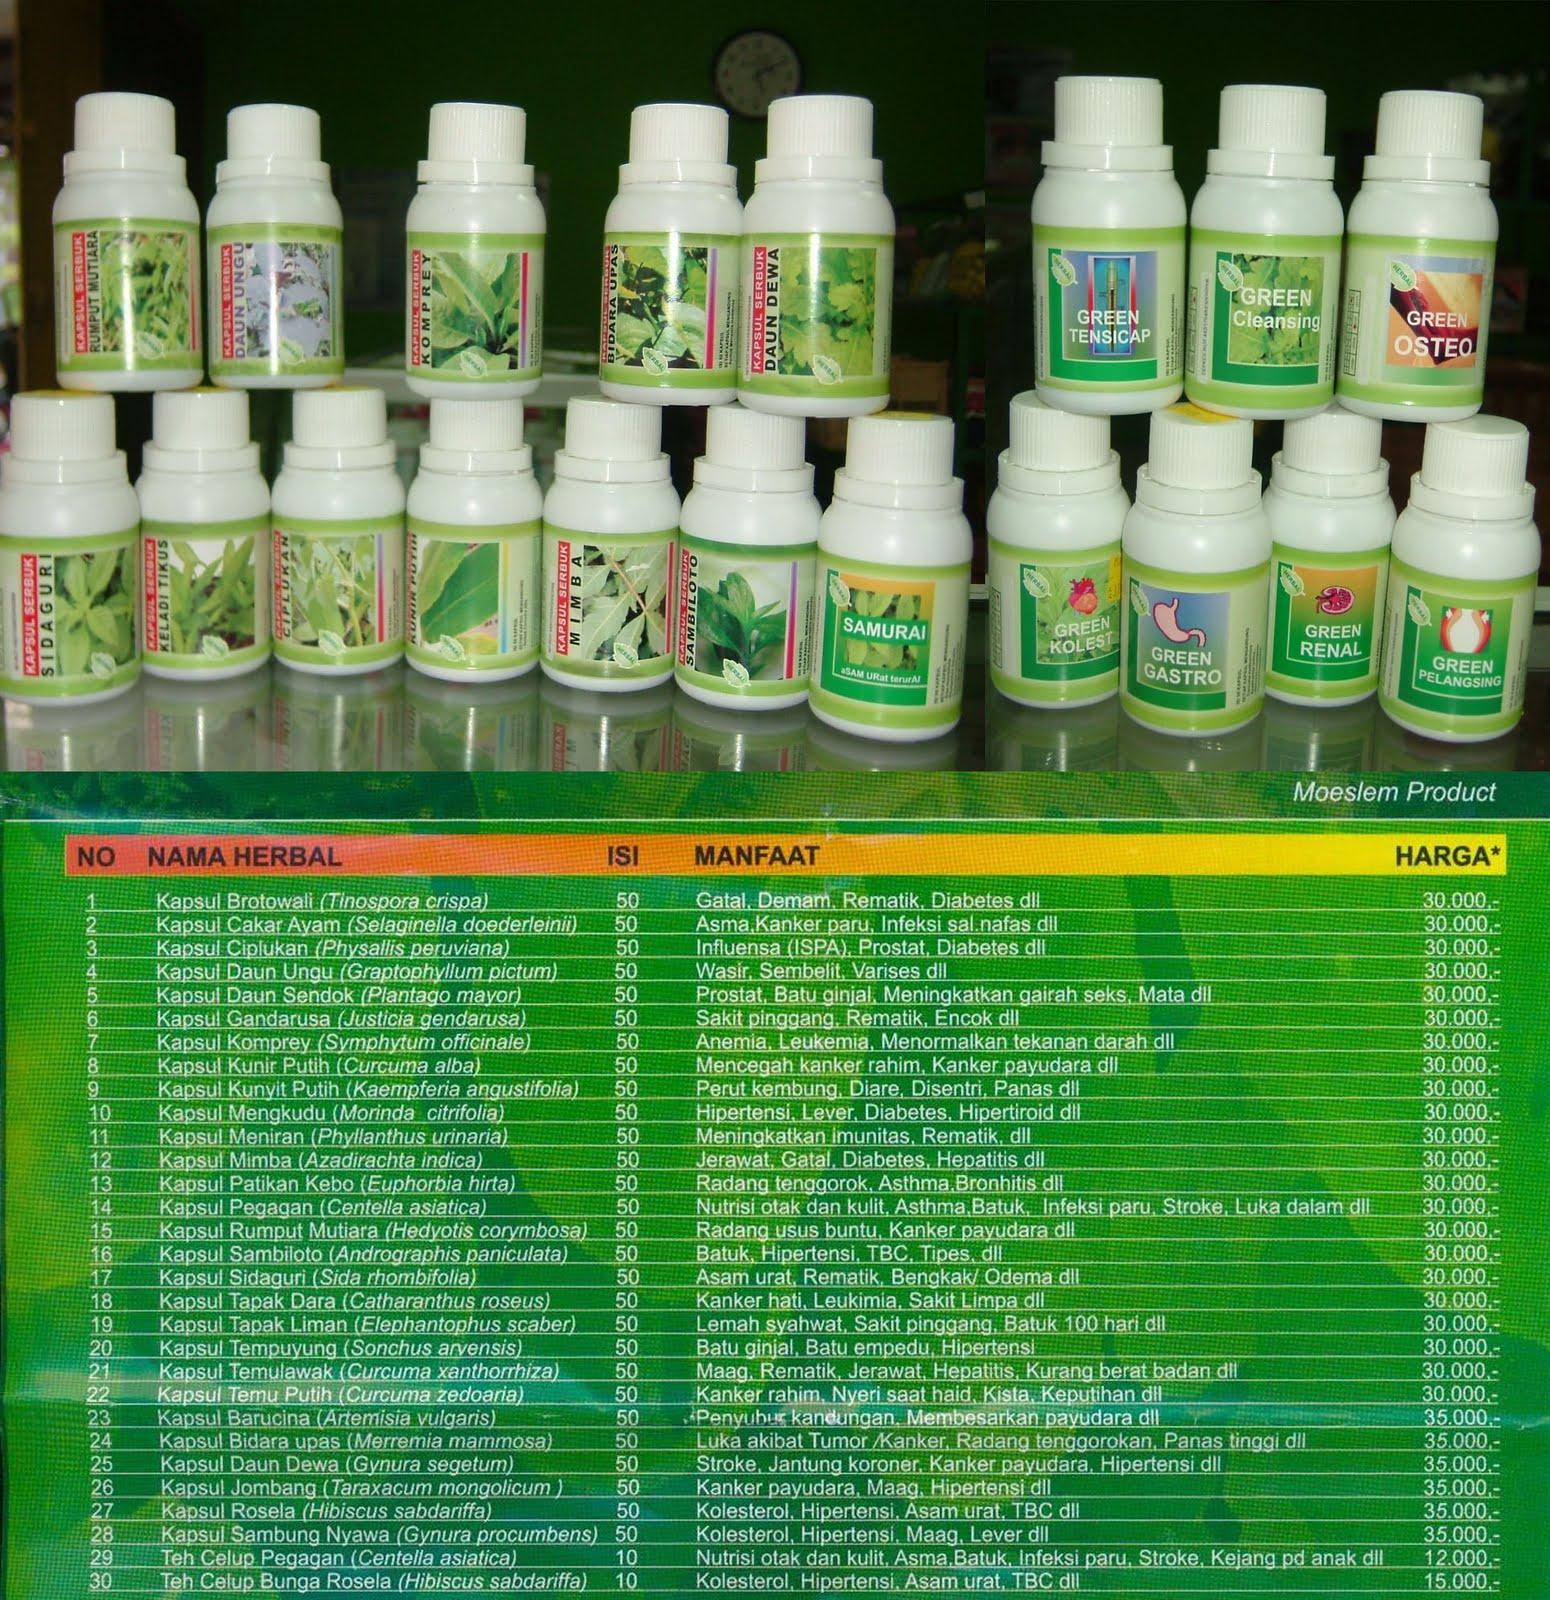 Indo Nesian Tradisi Onal Medicine Suruhan Obat: Jamu Dan Herbal MASTANI: Obat Herbal